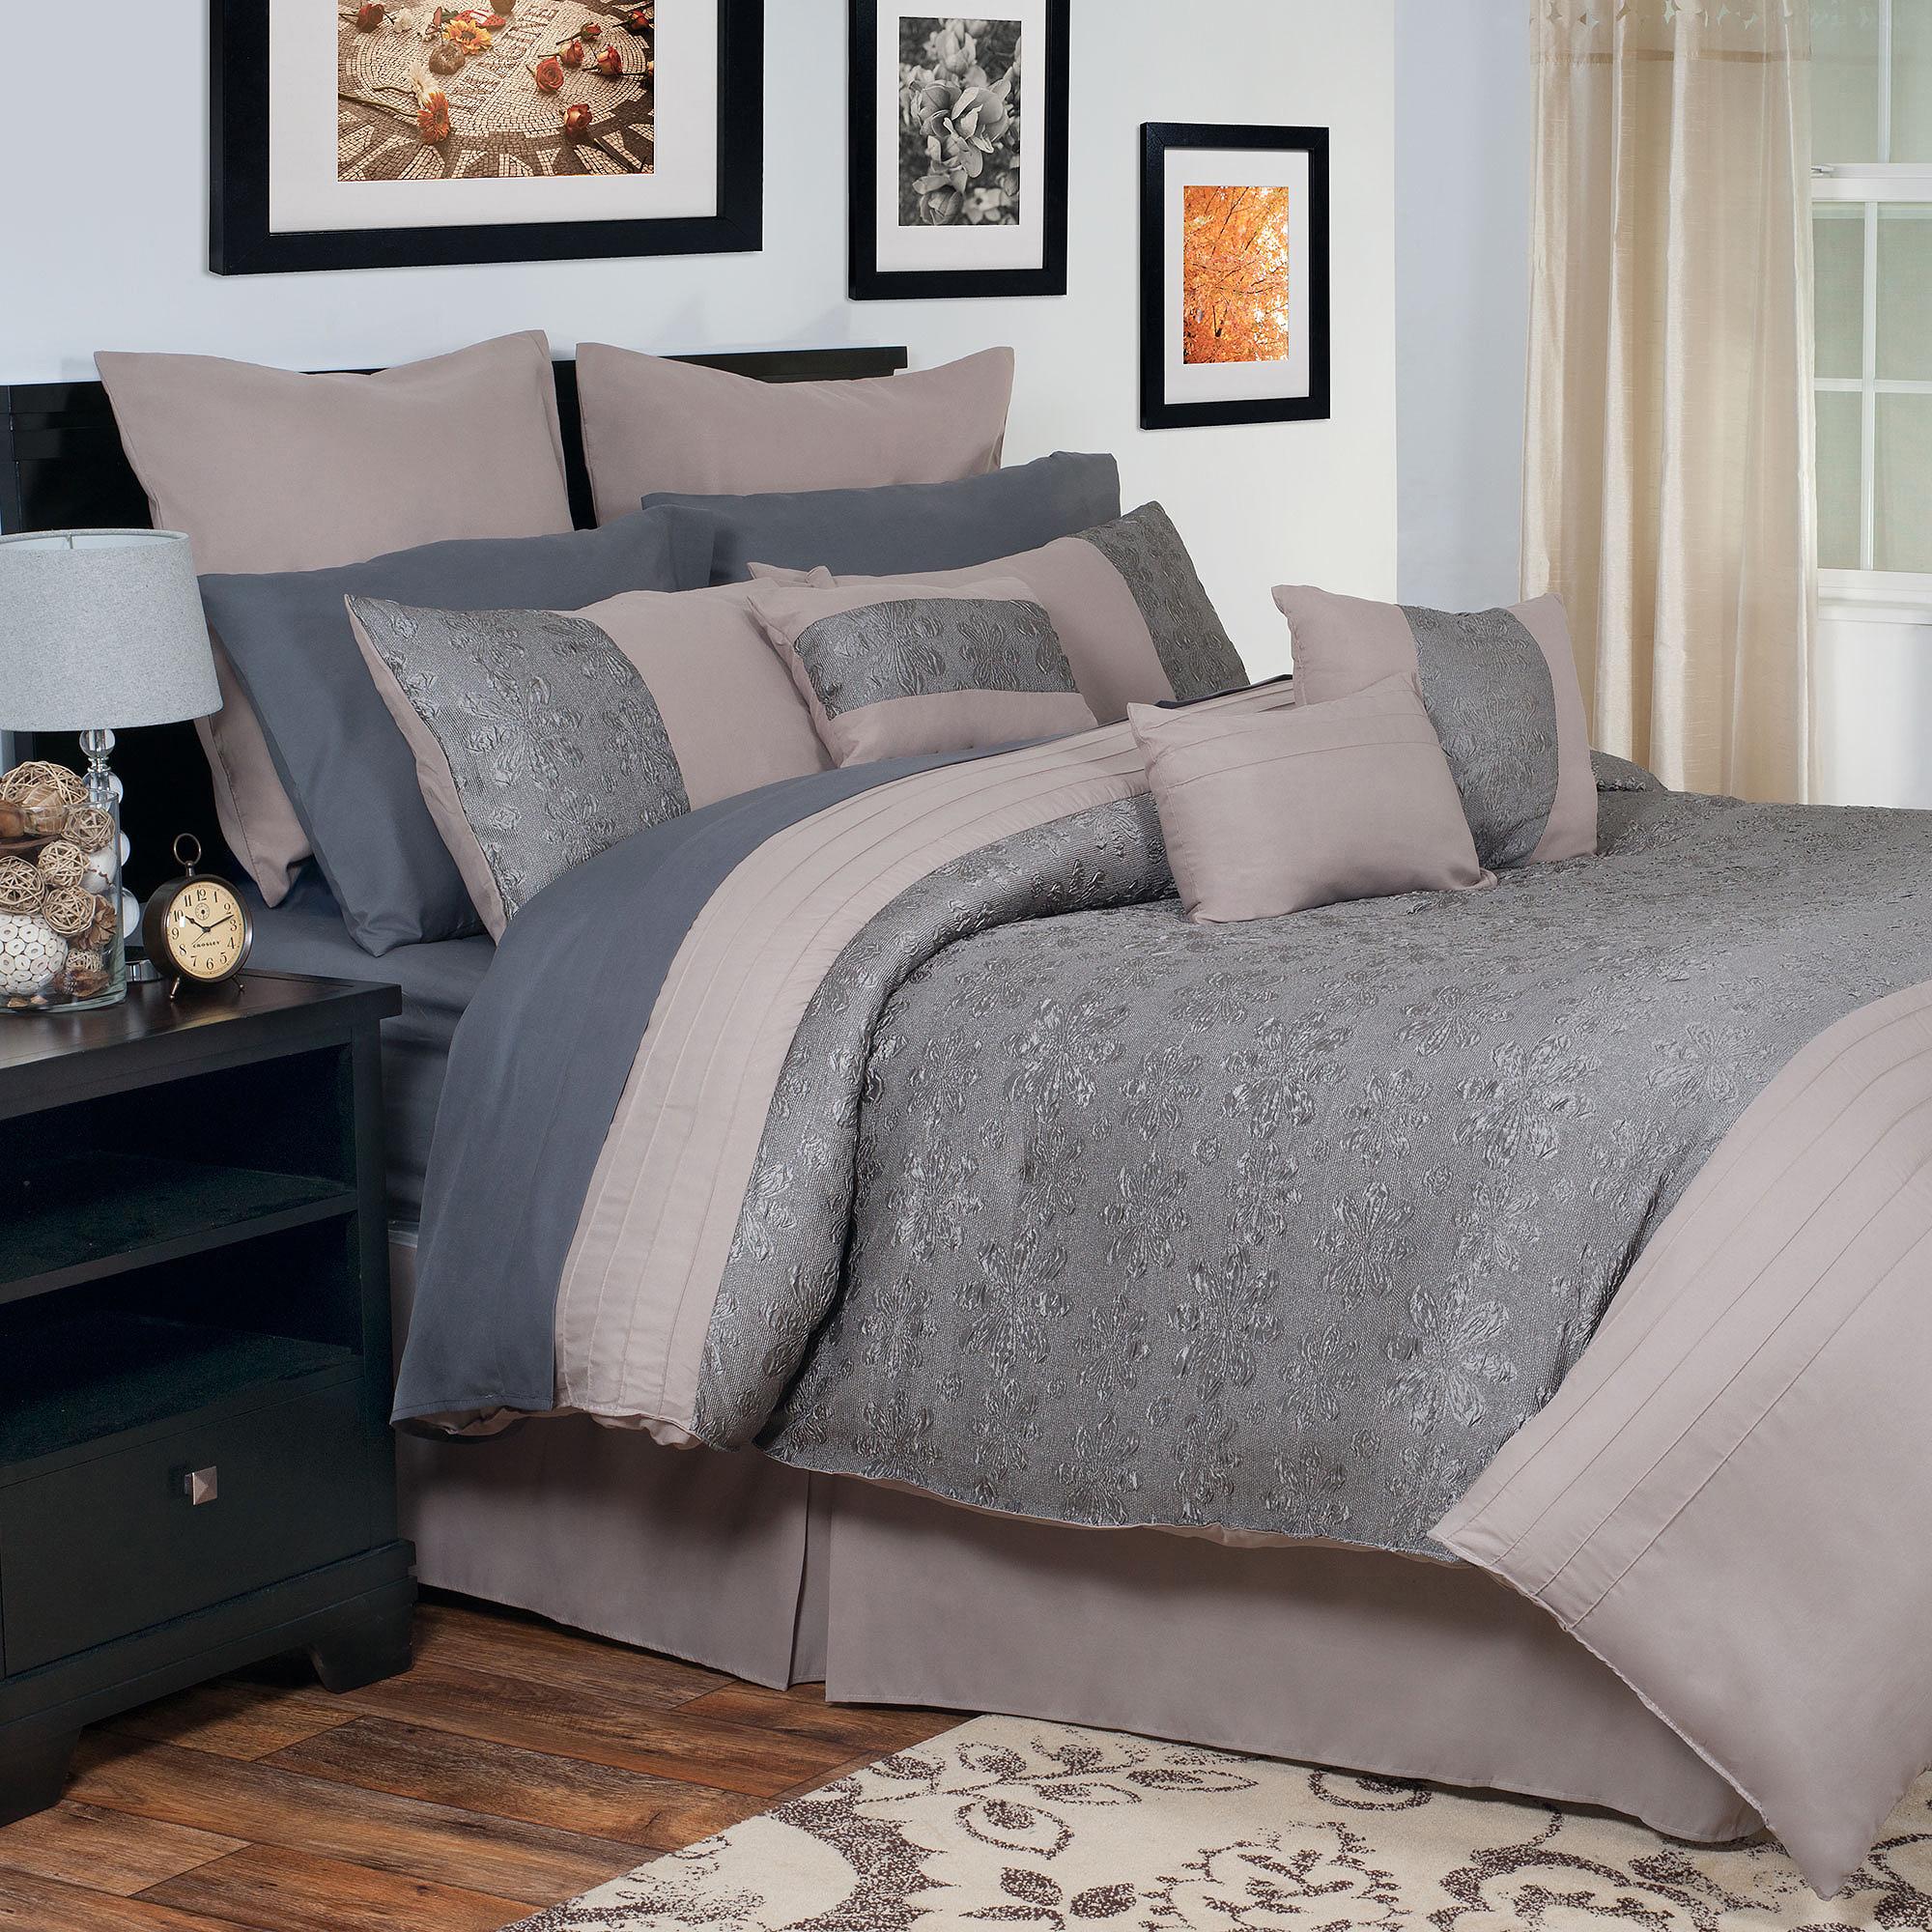 Somerset Home Leah Oversized Embroidered Bedding Comforter Set